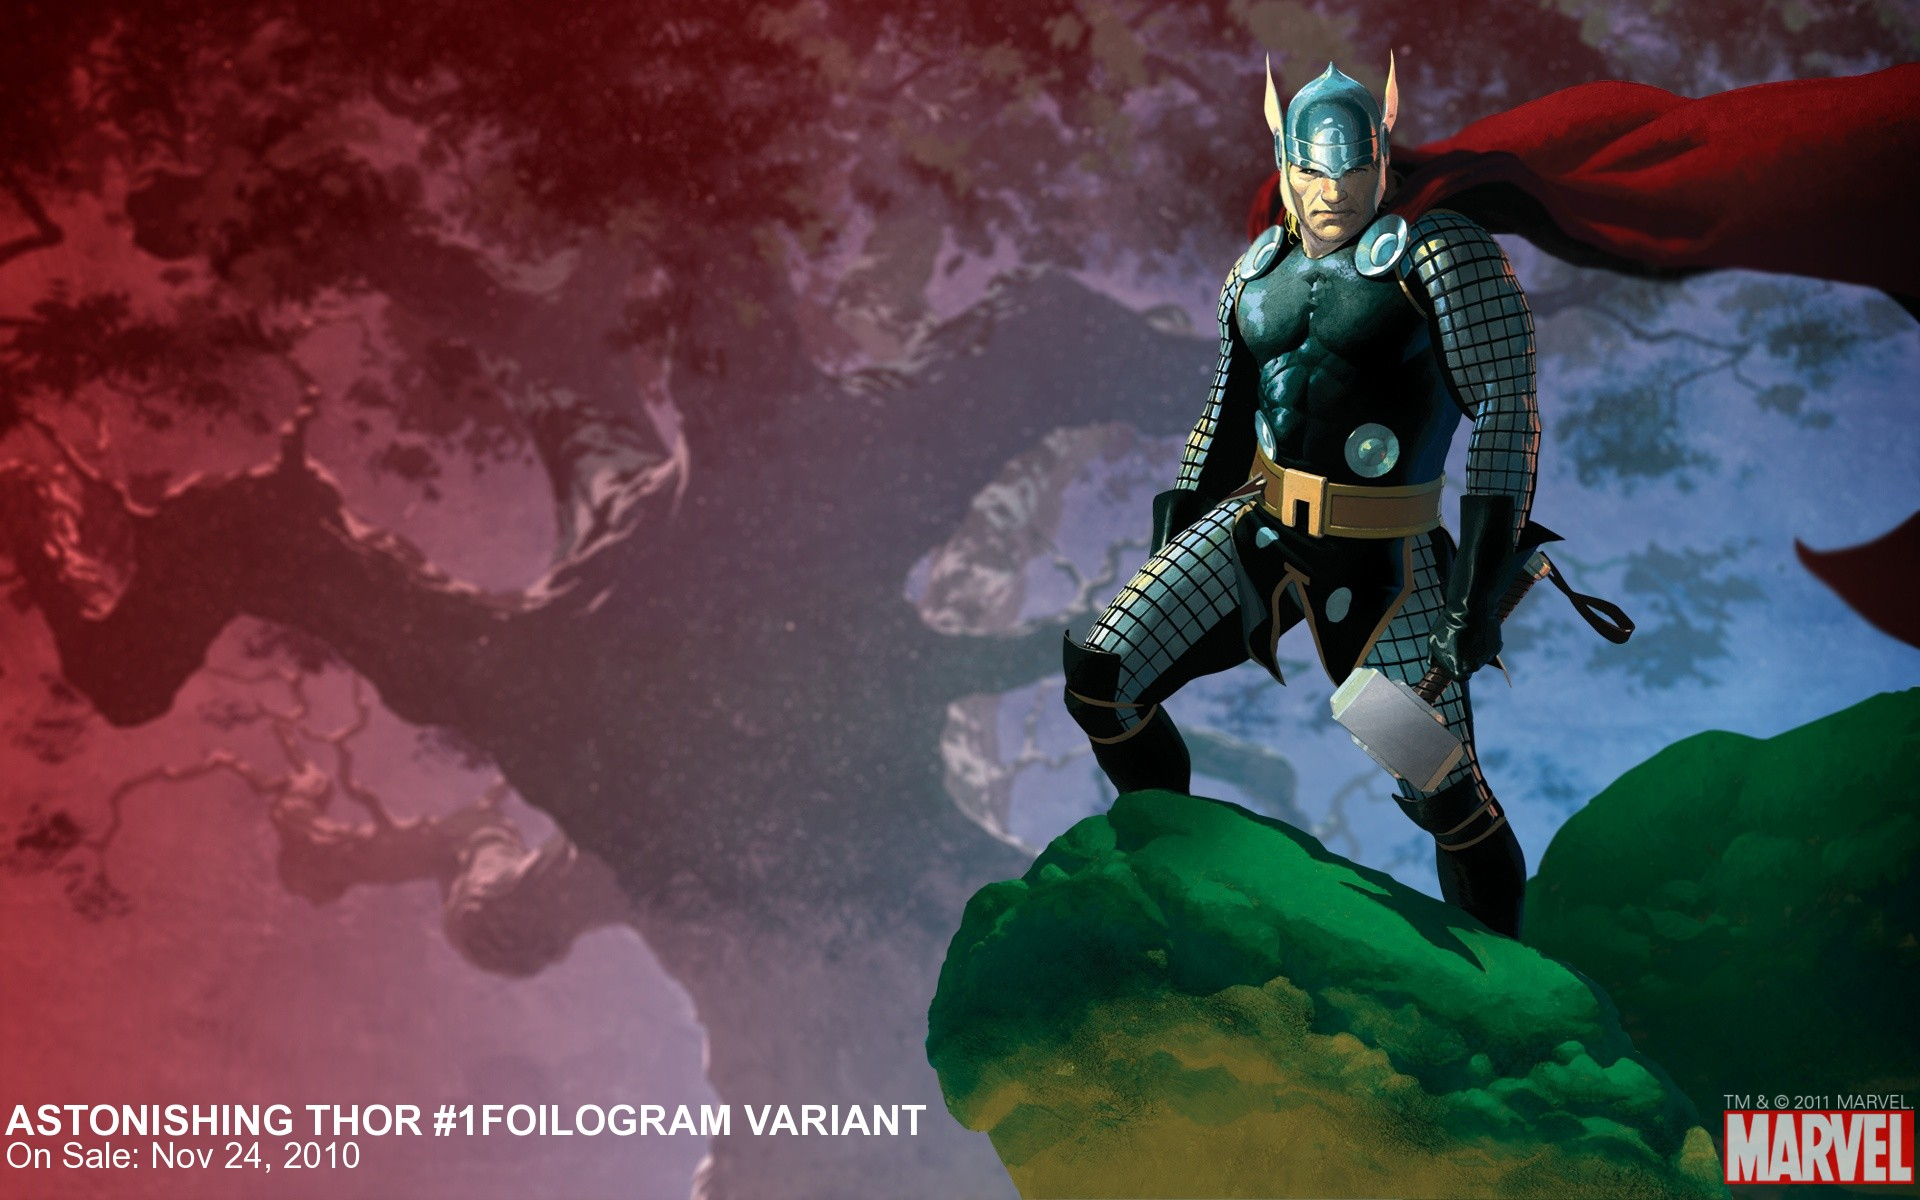 Simple Wallpaper Marvel Thor - wallpaper_widescreen  Graphic_452125.jpg